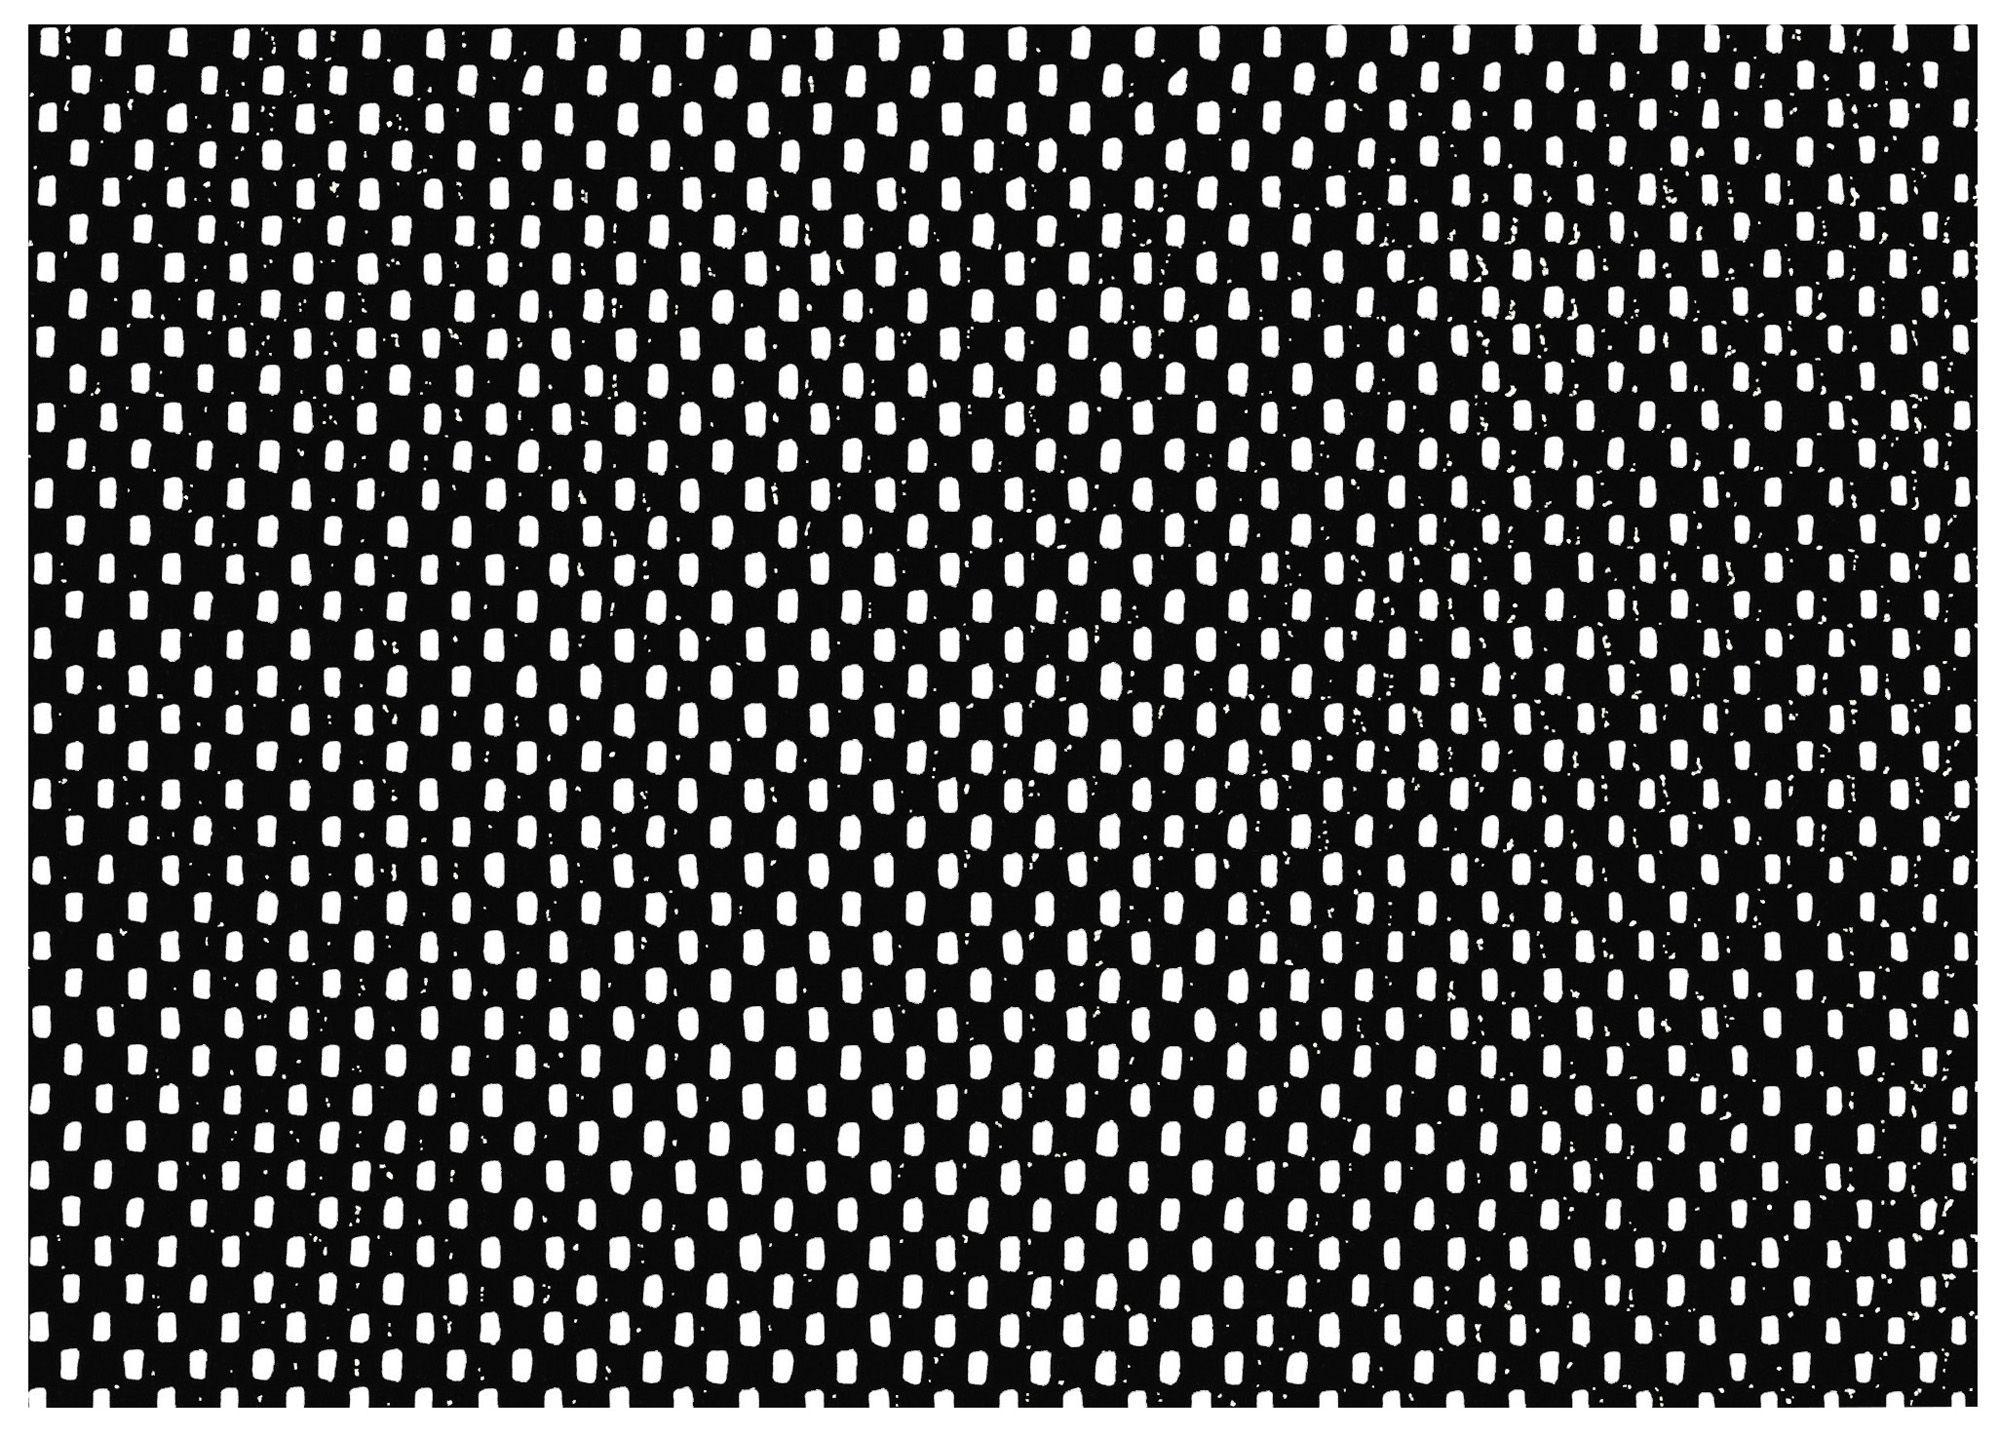 diy kitchen tables birch cabinets d-c-fix black rubber bath mat (l)1500mm (w)300mm ...